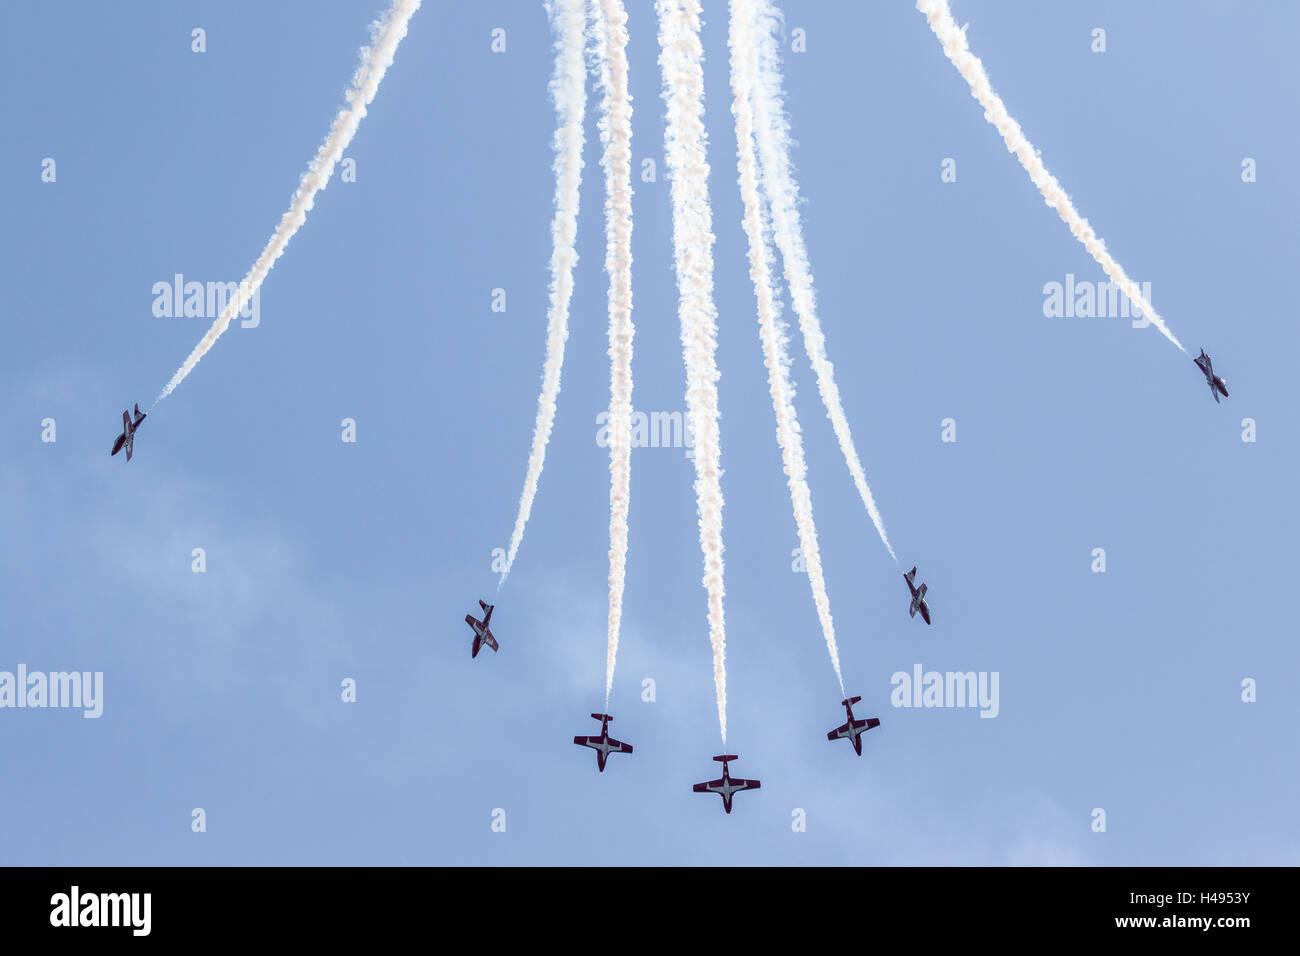 Seven Canadian Forces Snowbirds Execute a Downward Bomb Burst Stock Photo